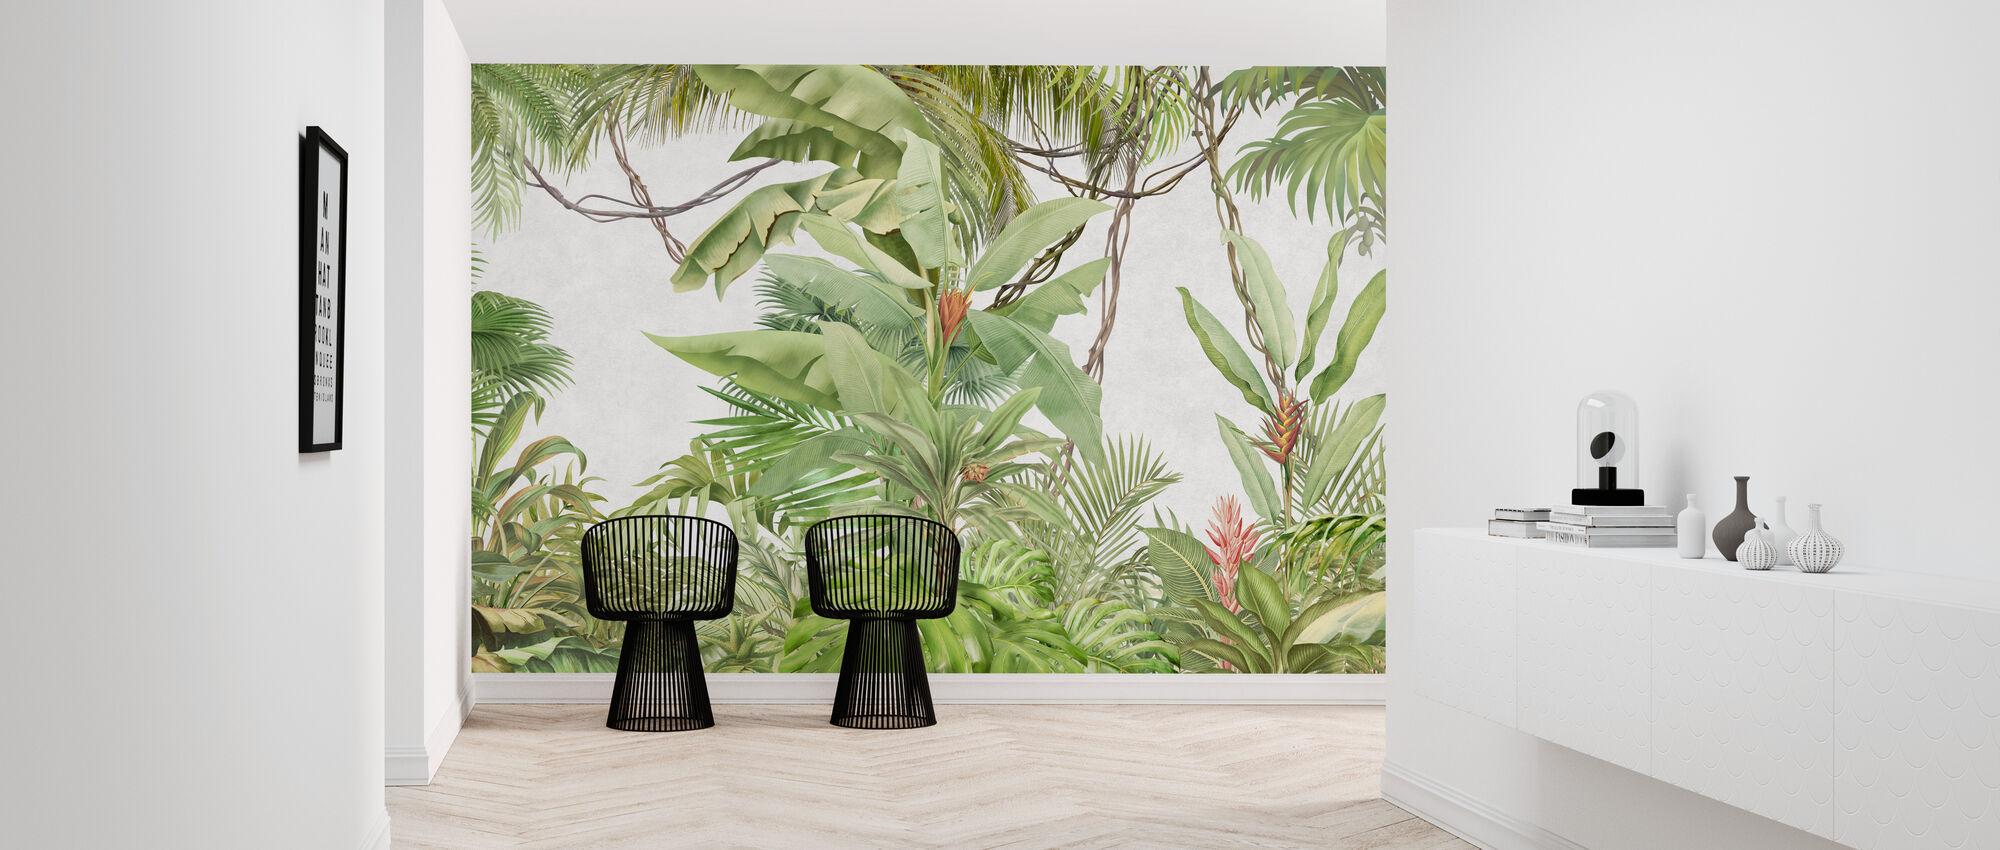 Diep Tropisch op lichte betonnen muur - Behang - Gang